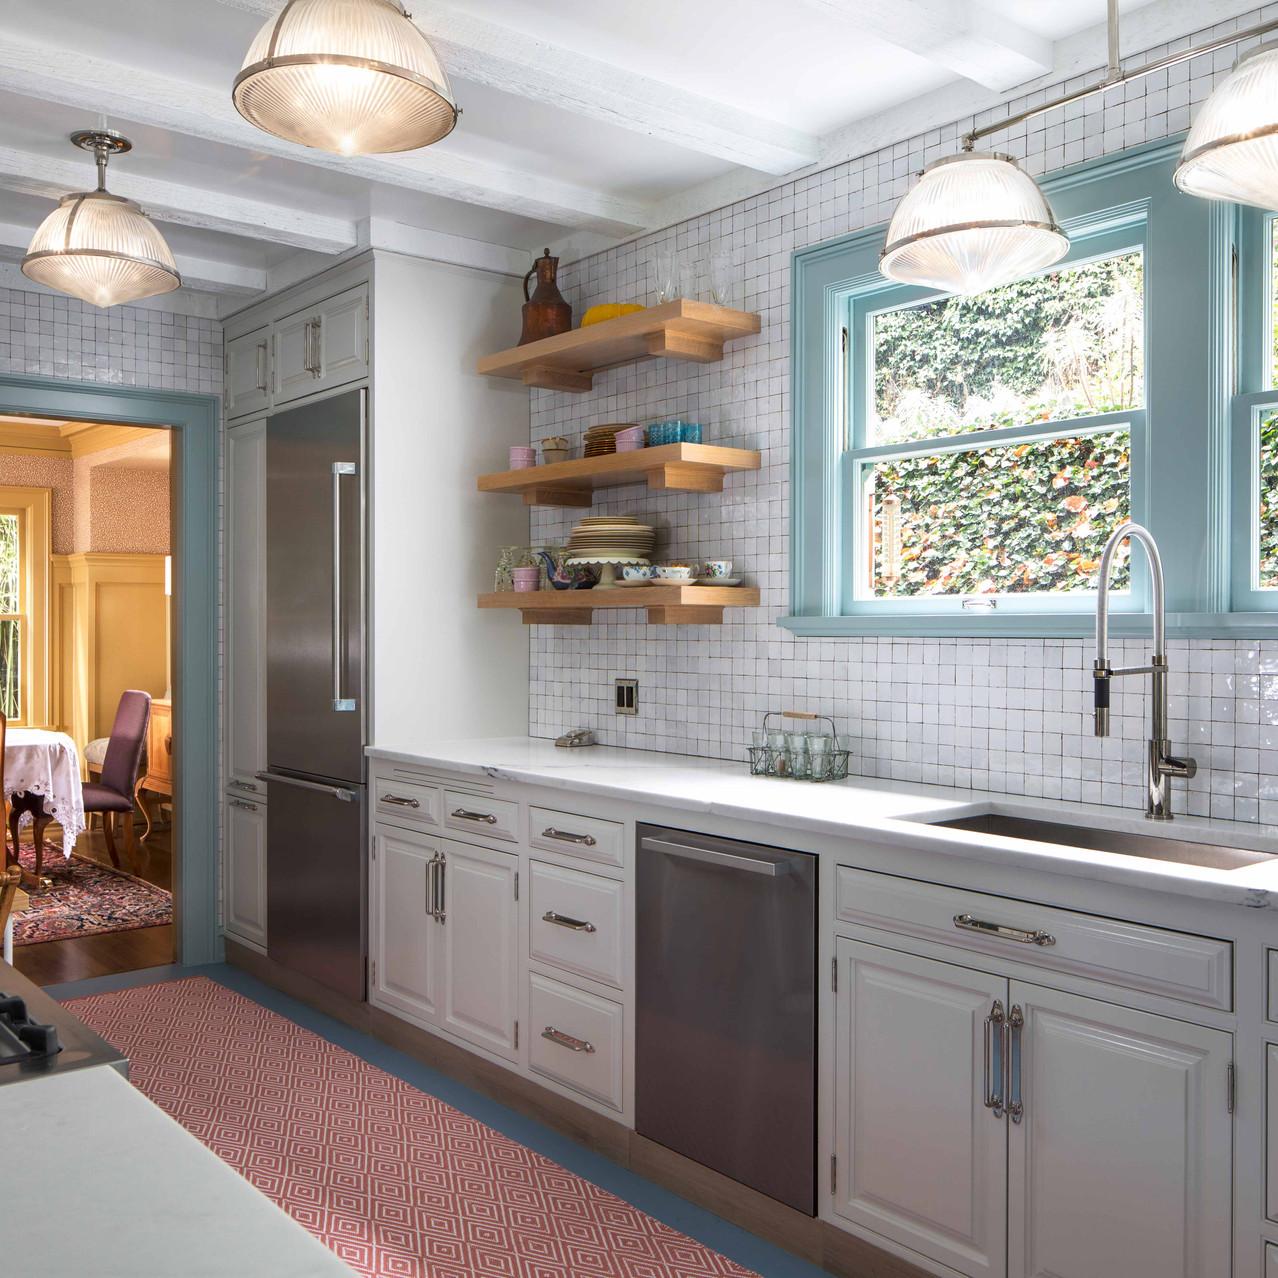 high gloss white tile Portland kitchen design Daniel House